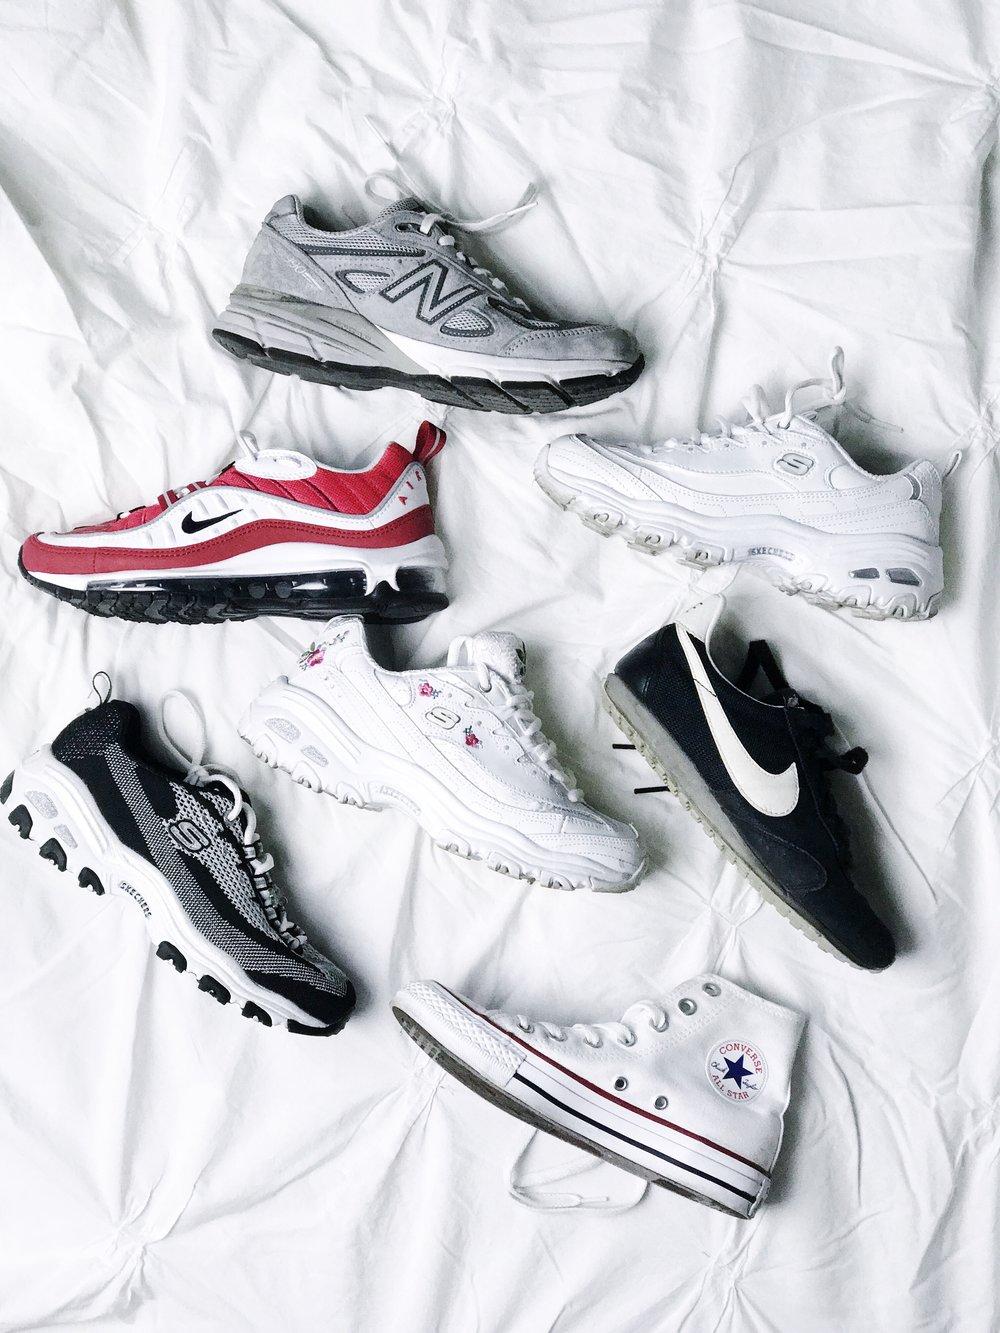 dad-shoes-summer-2018.jpg